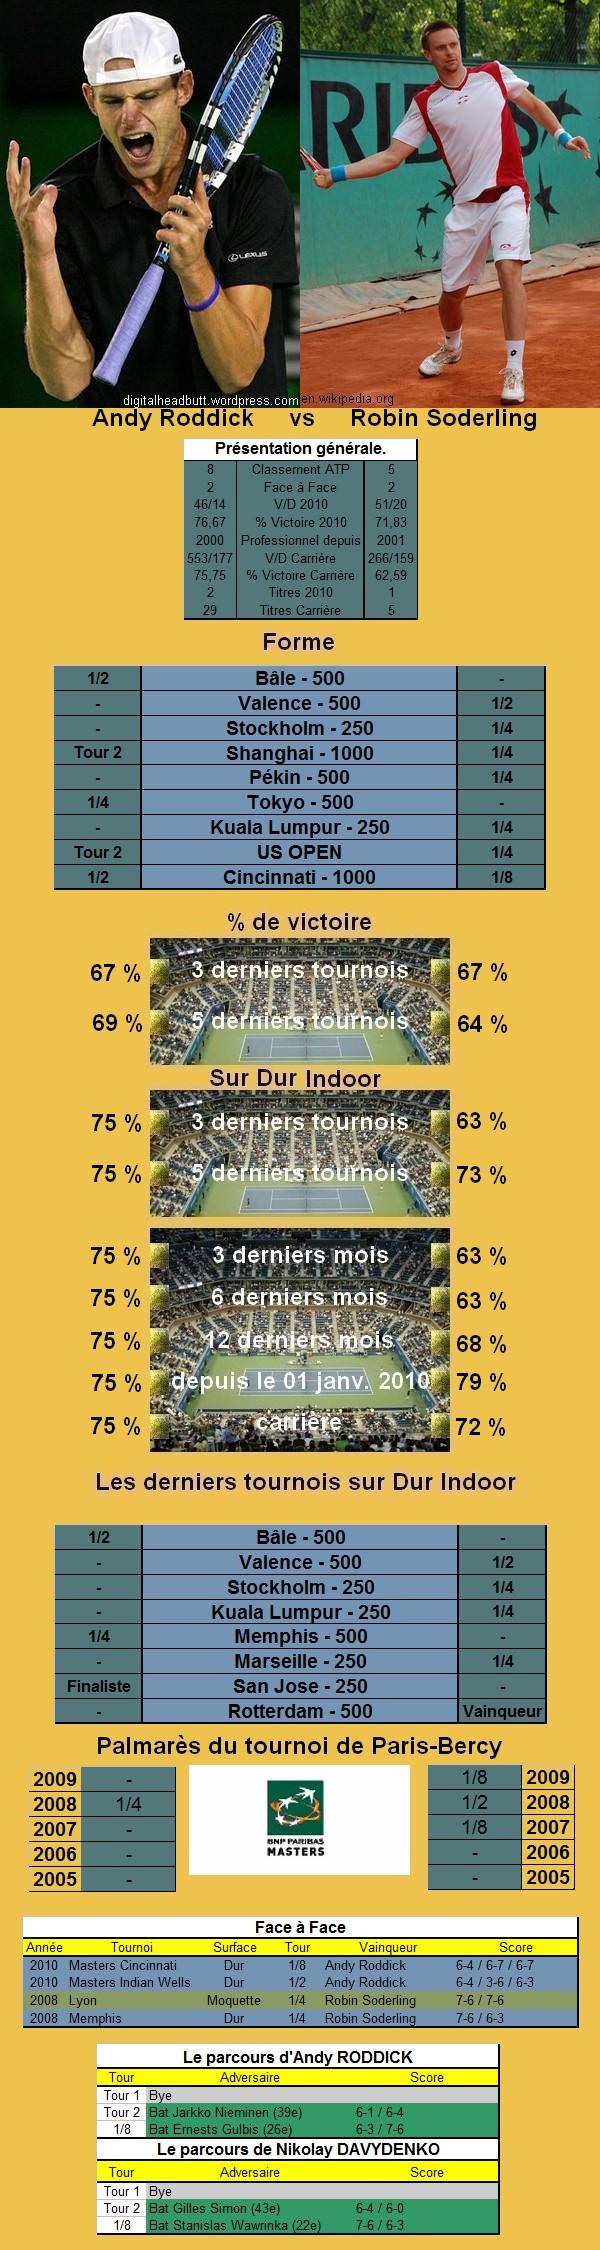 Statistiques tennis de Roddick contre Soderling à Paris Bercy